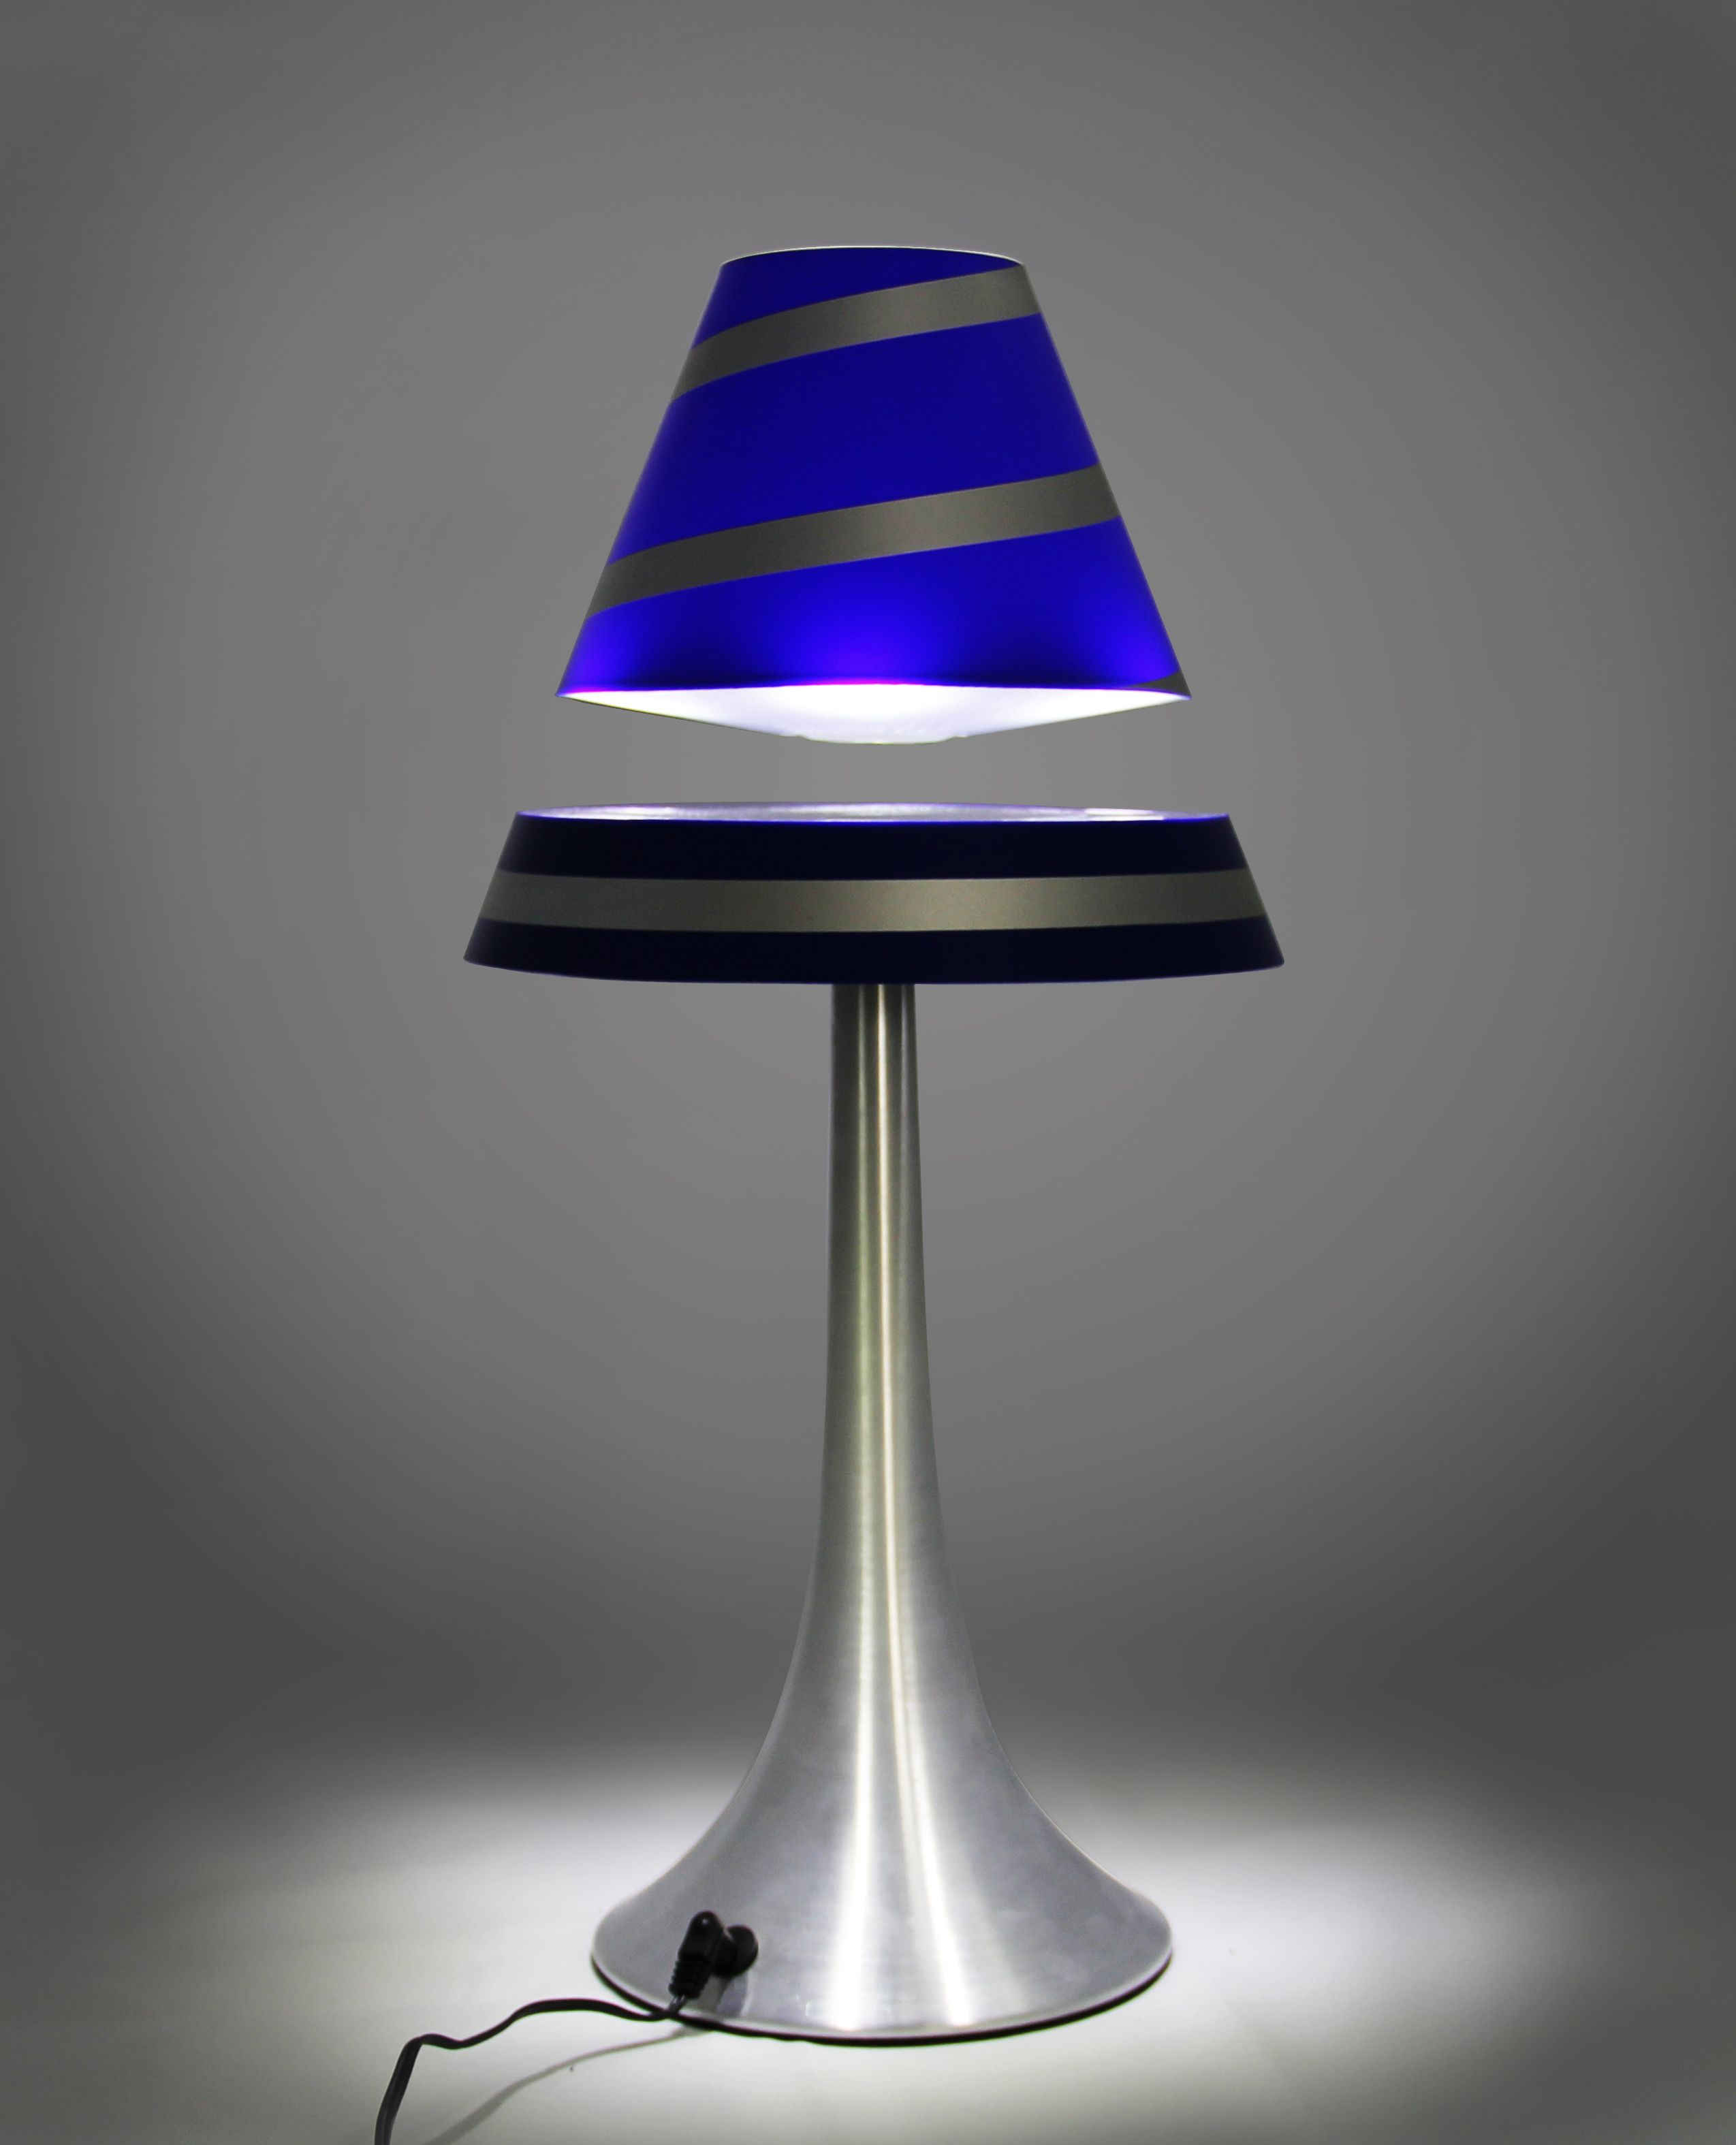 LED Floating Lamp / LED zwevende Lamp www.led-verlichting.org ...